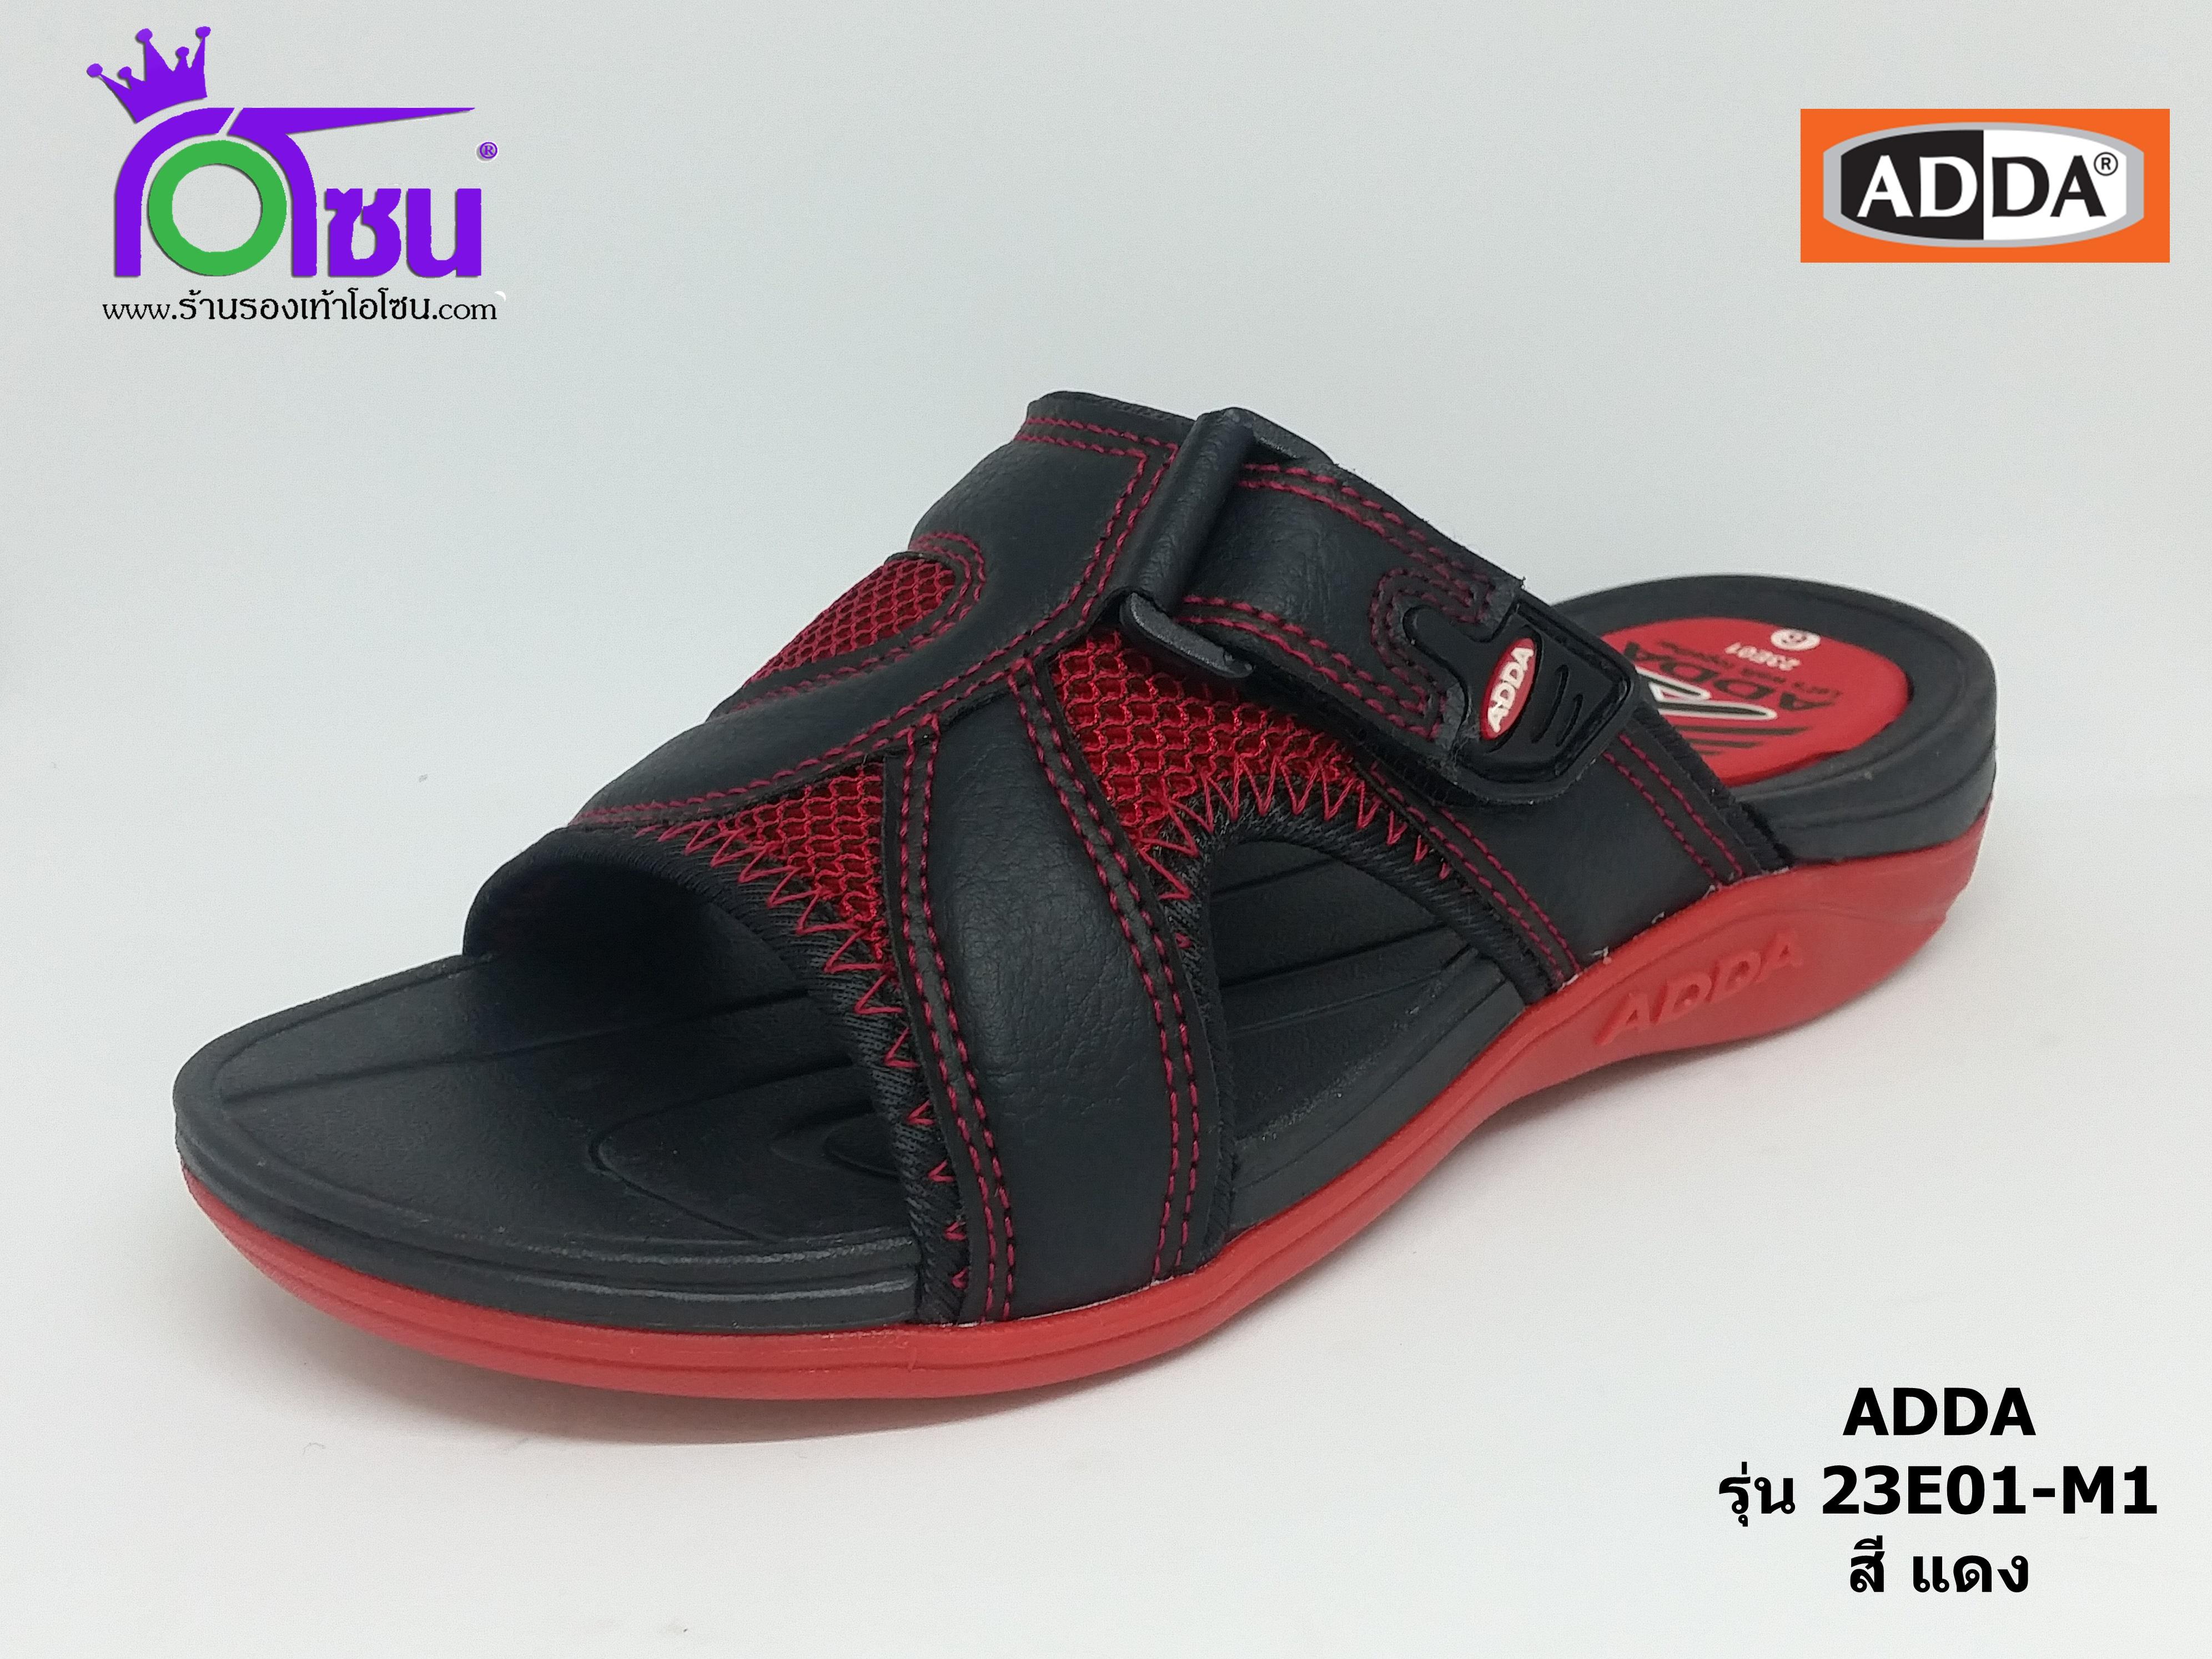 ADDA แอดด๊า รหัส 23E01 สีแดง เบอร์ 4-9 สำเนา